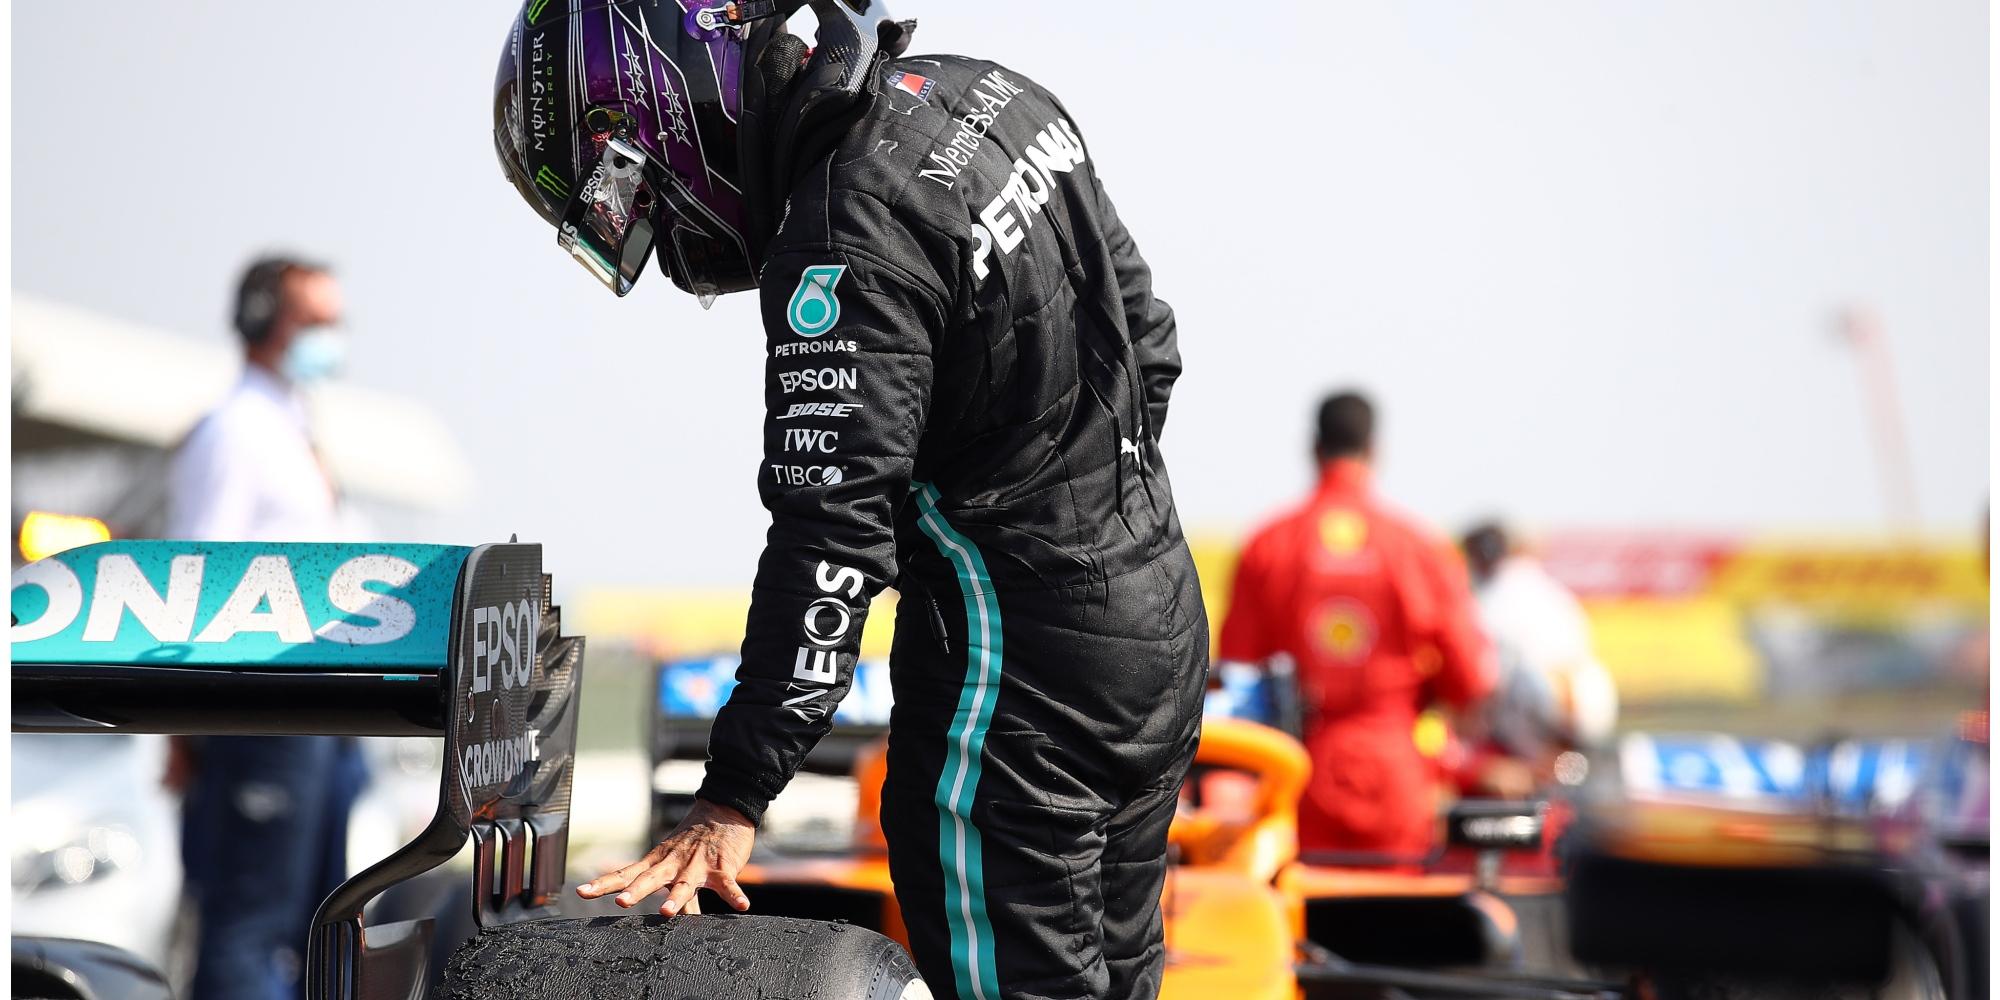 Lewis Hamilton, 2020 70th Anniversary GP